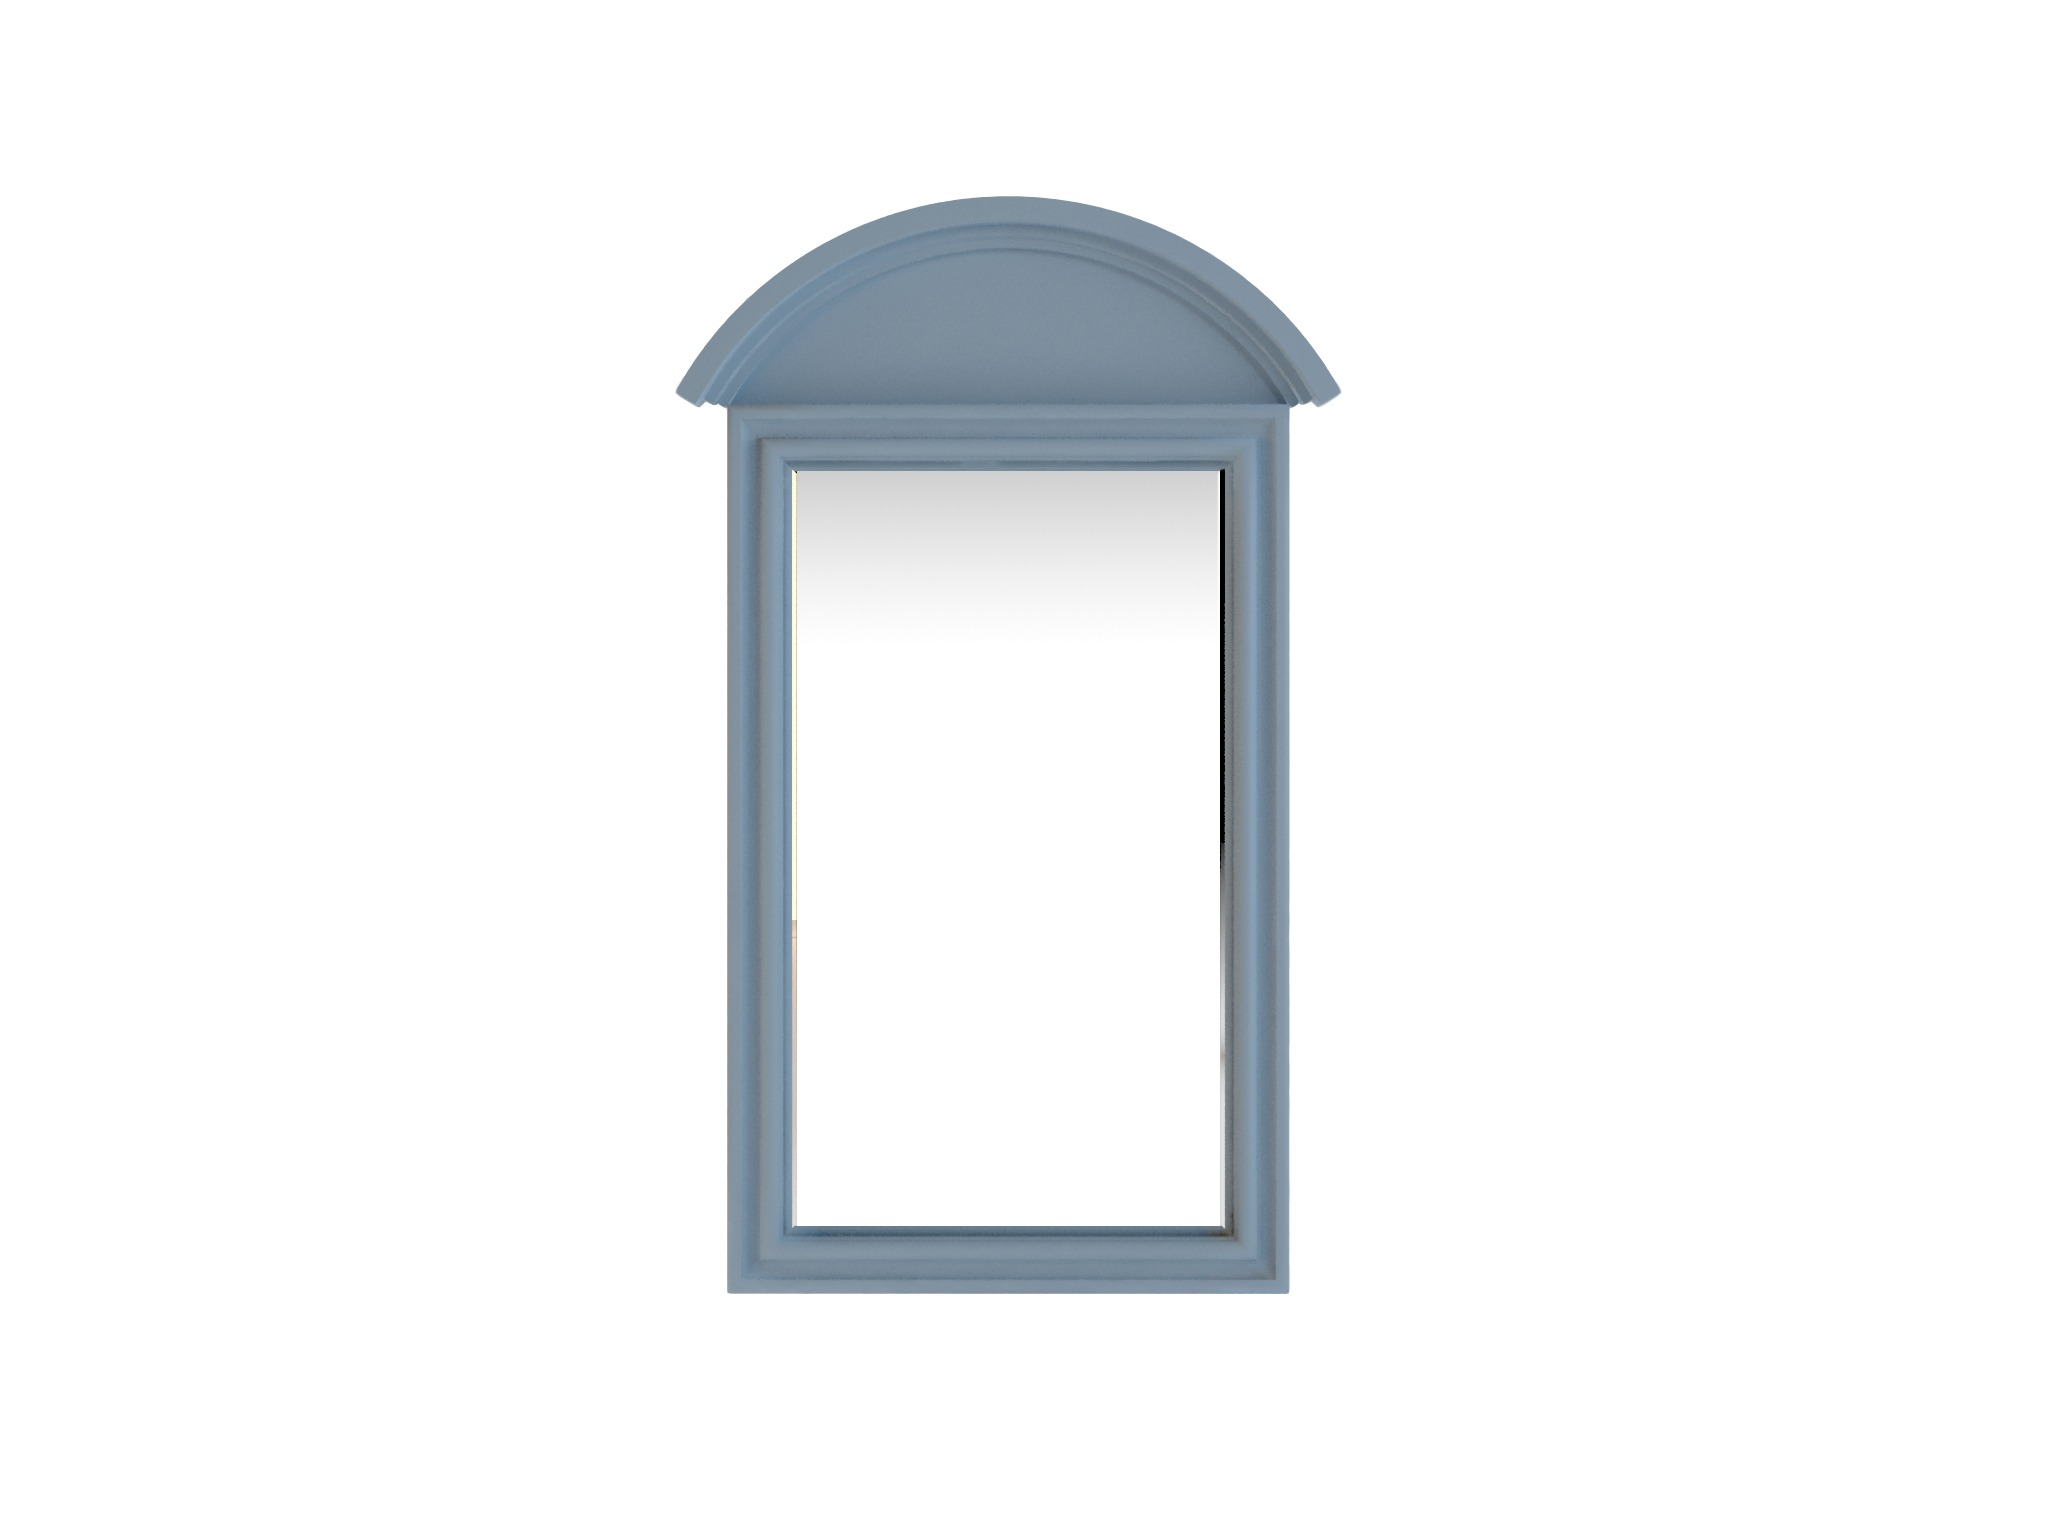 Зеркало LeontinaНастенные зеркала<br>Вес: 8  кг,<br><br>Material: Береза<br>Width см: None<br>Depth см: None<br>Height см: None